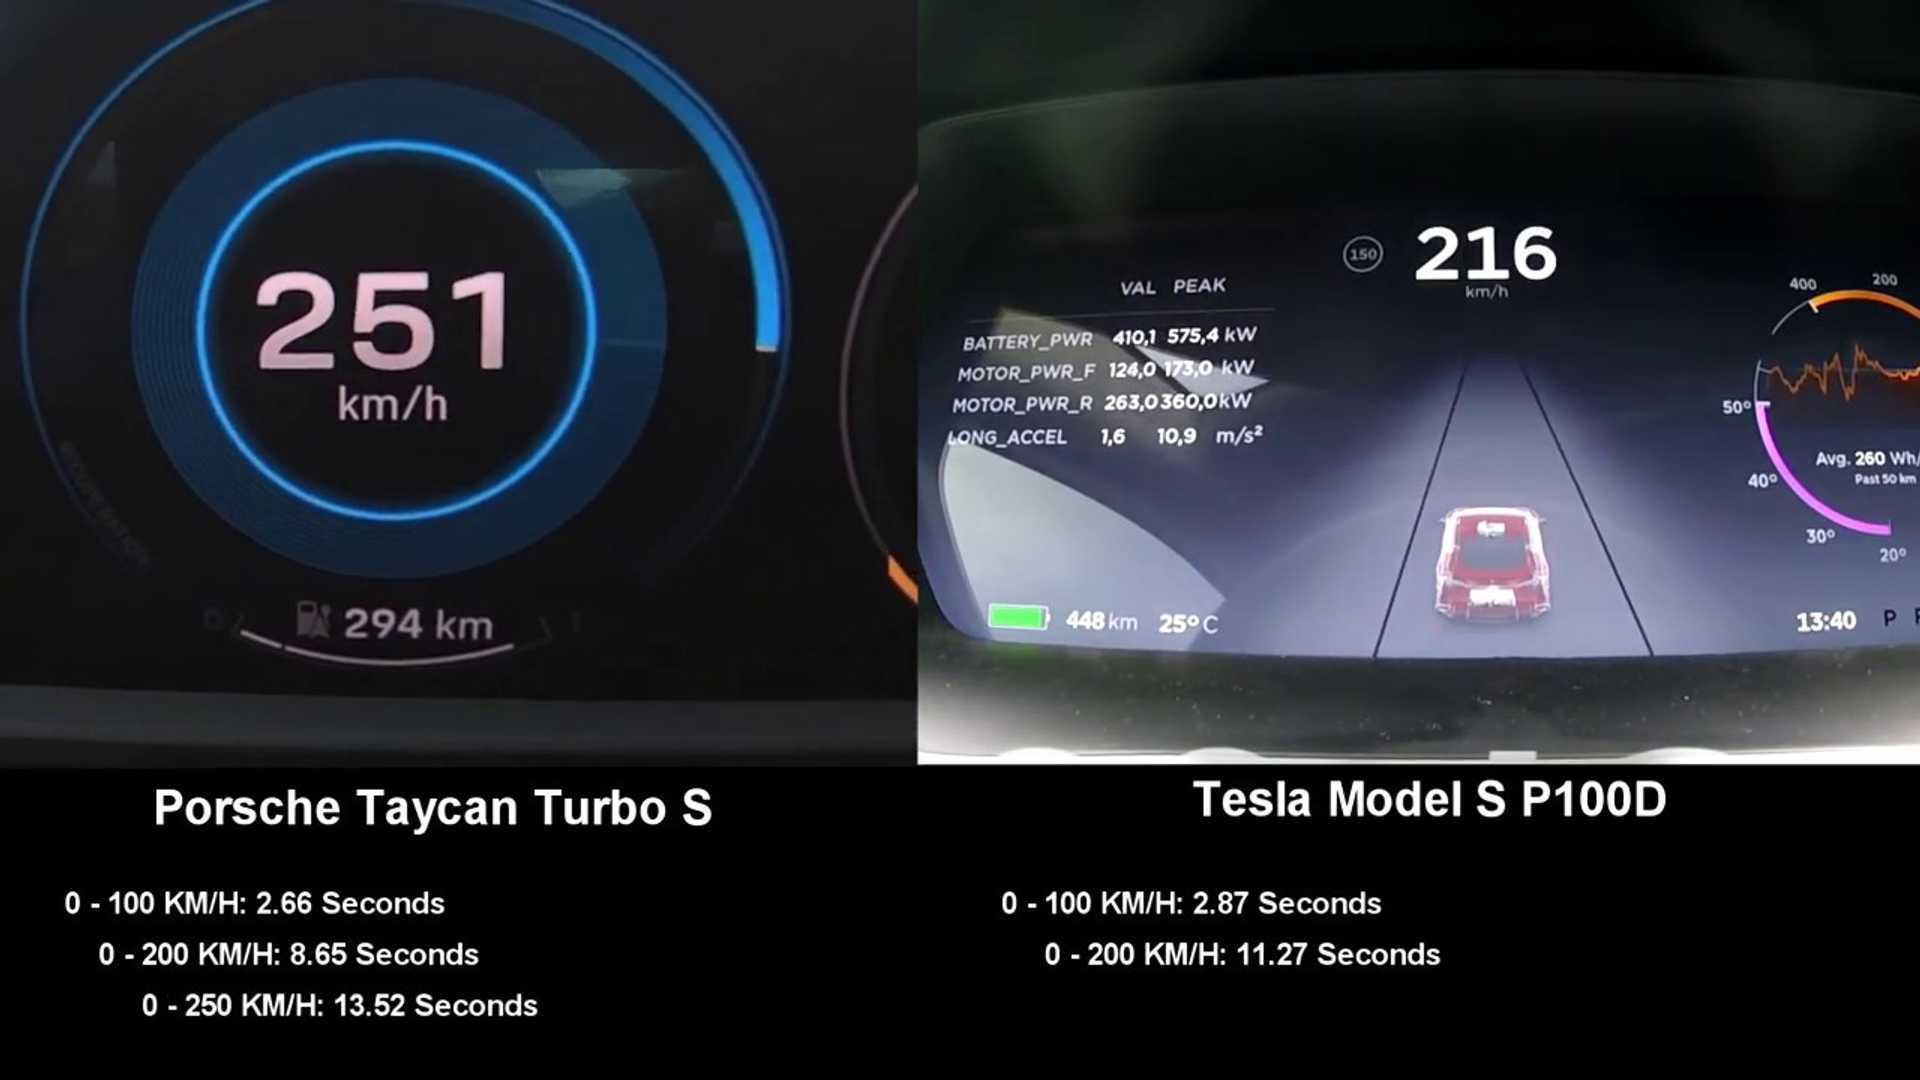 Porsche Taycan Turbo S vs Tesla Model S P100D: 0-155 mph times